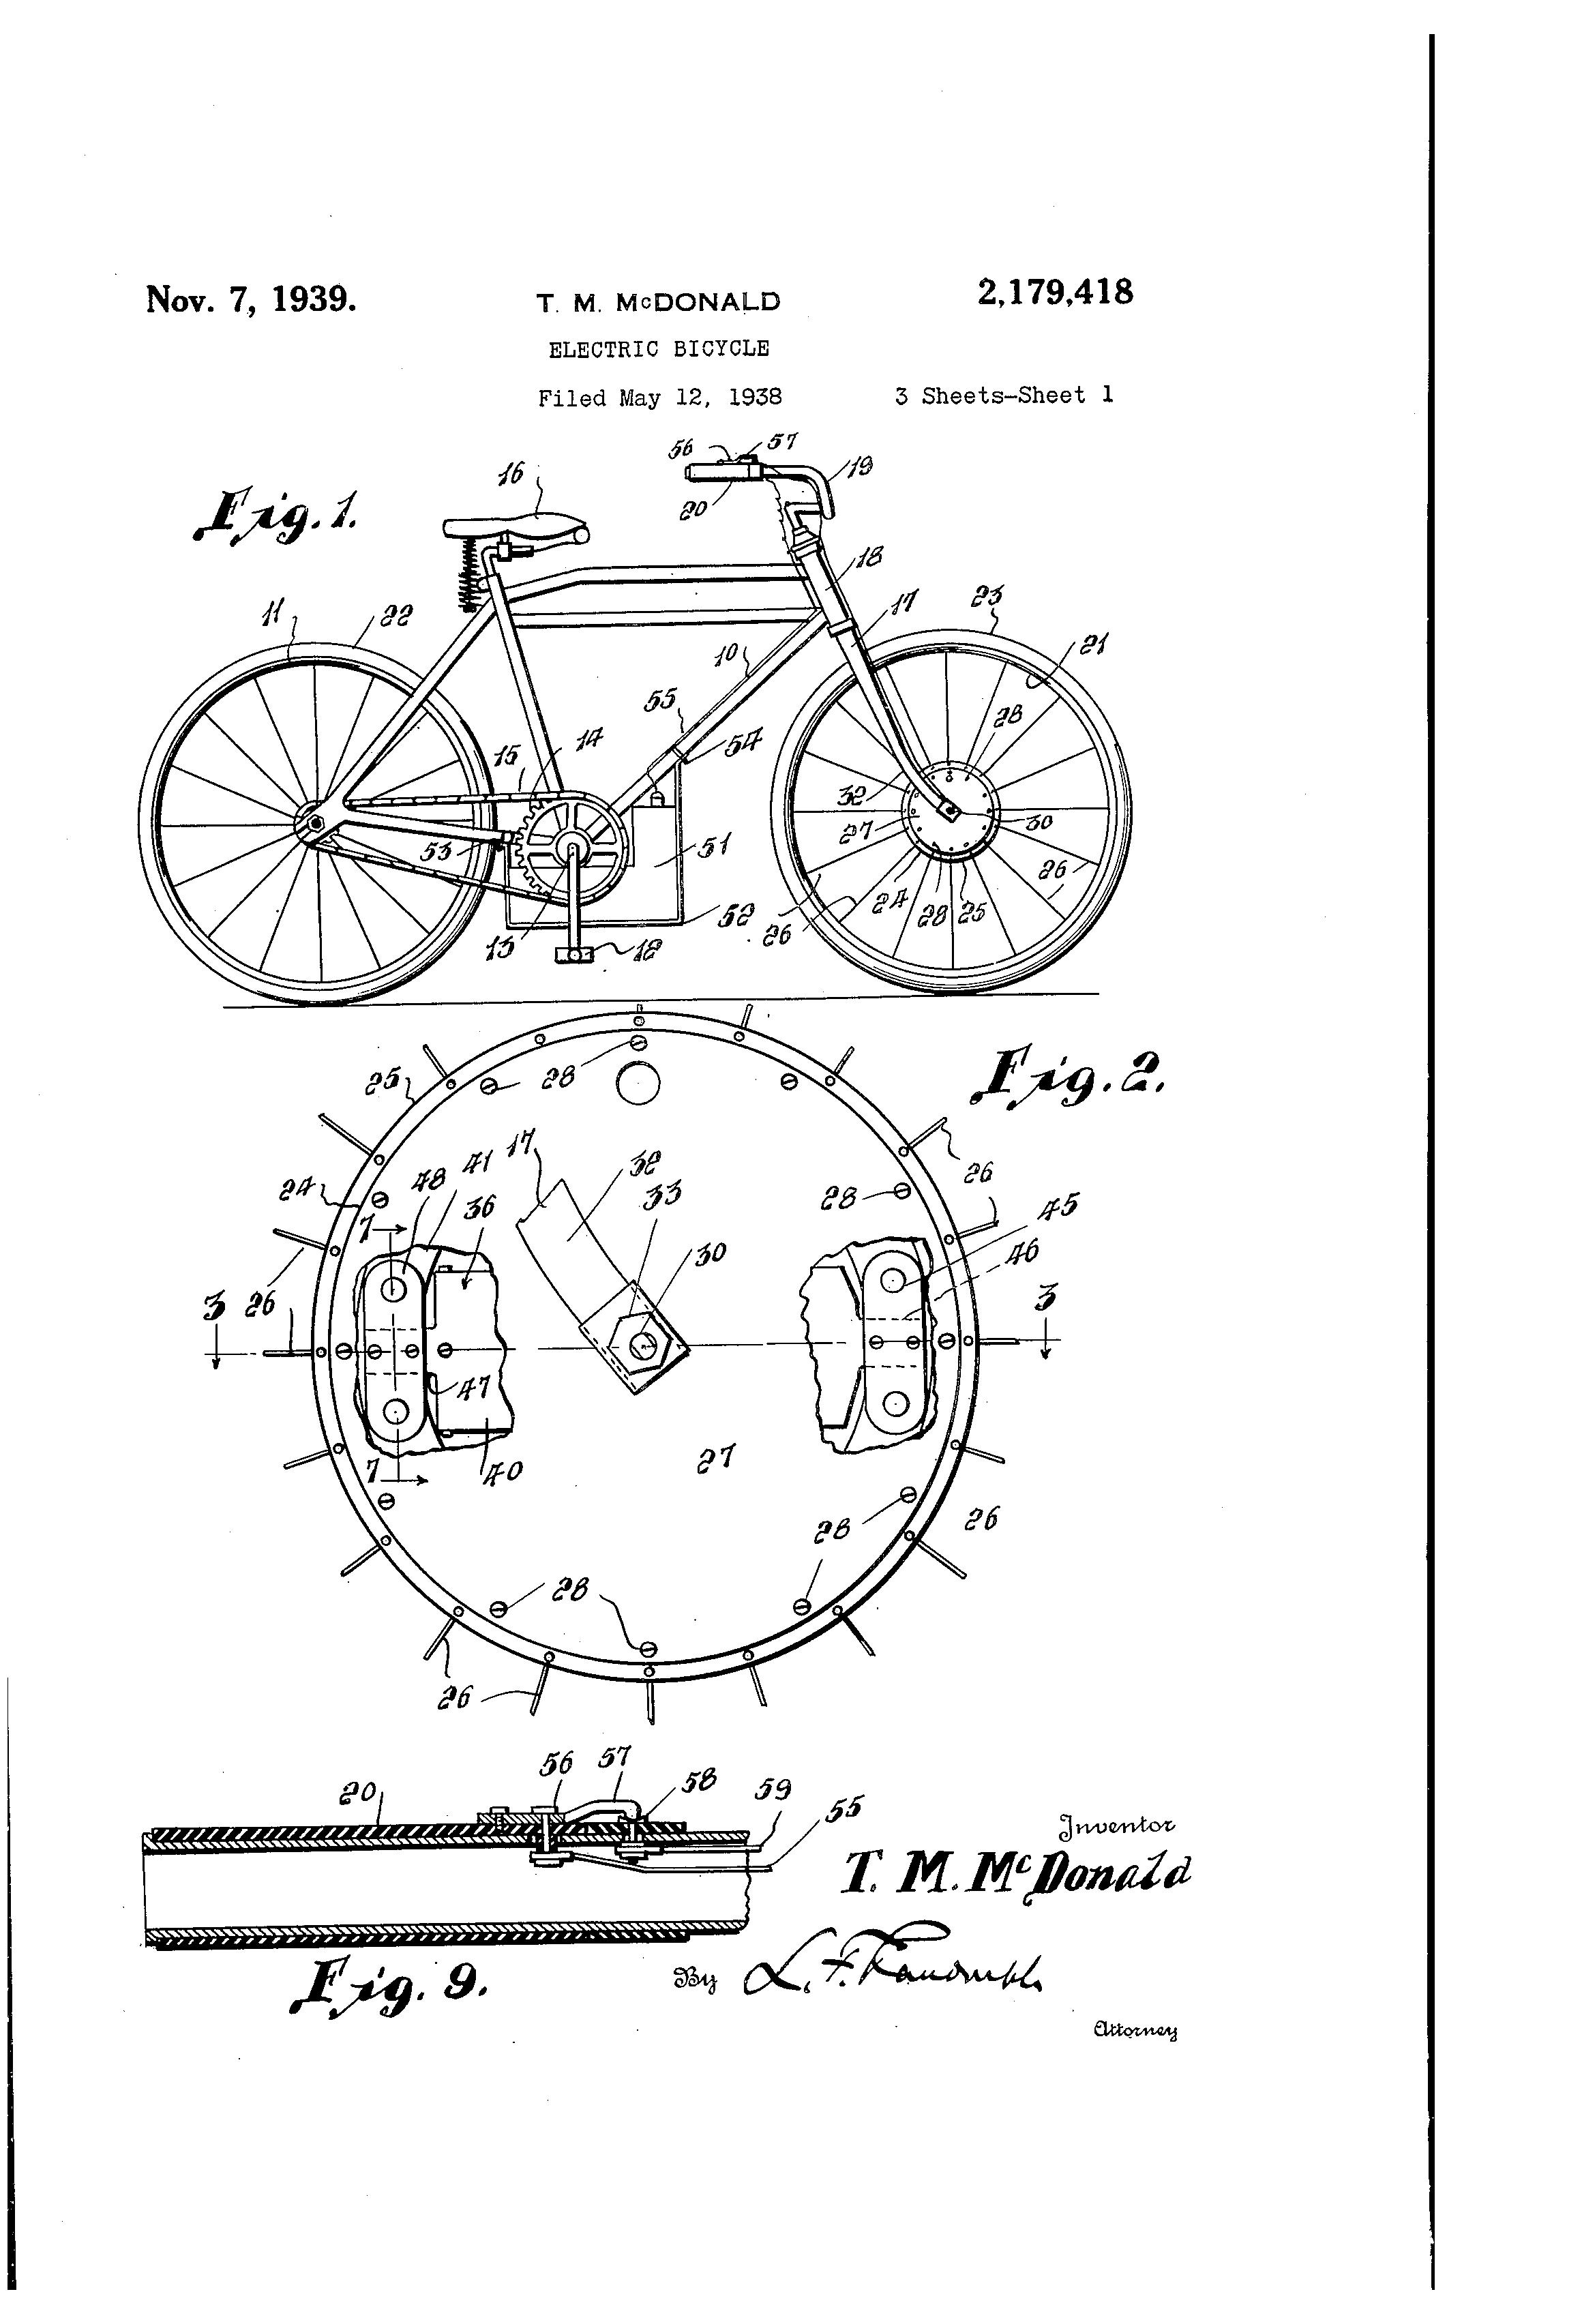 The McDonald Motor